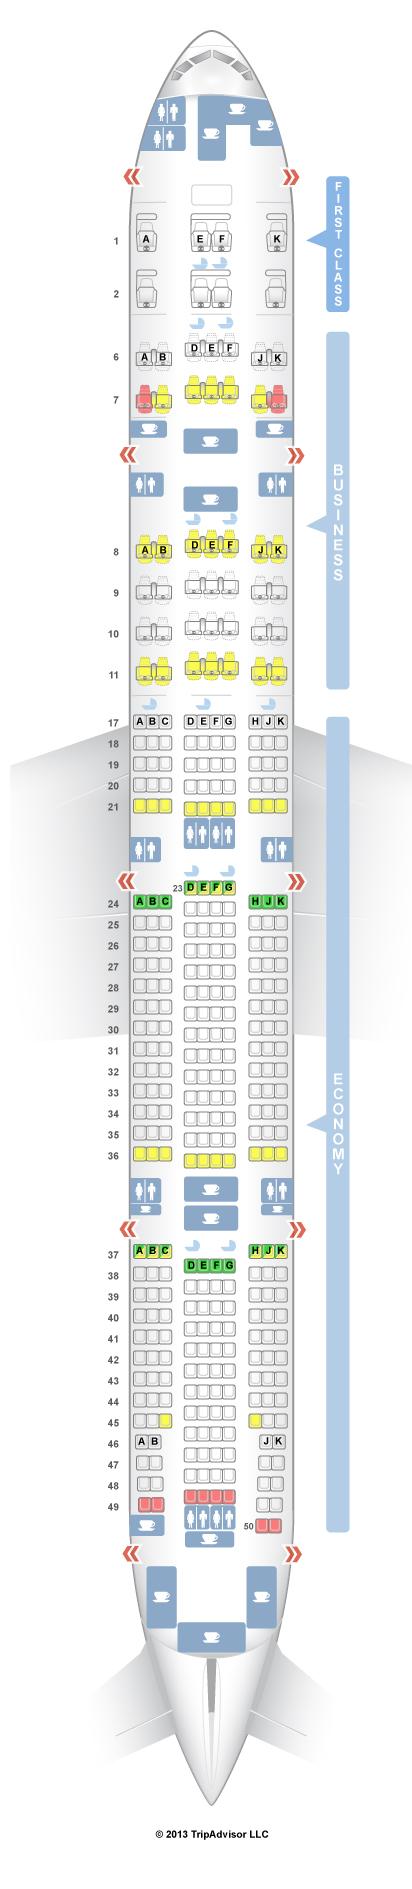 SeatGuru Seat Map Emirates Boeing 777 300ER (77W) Three Class V1